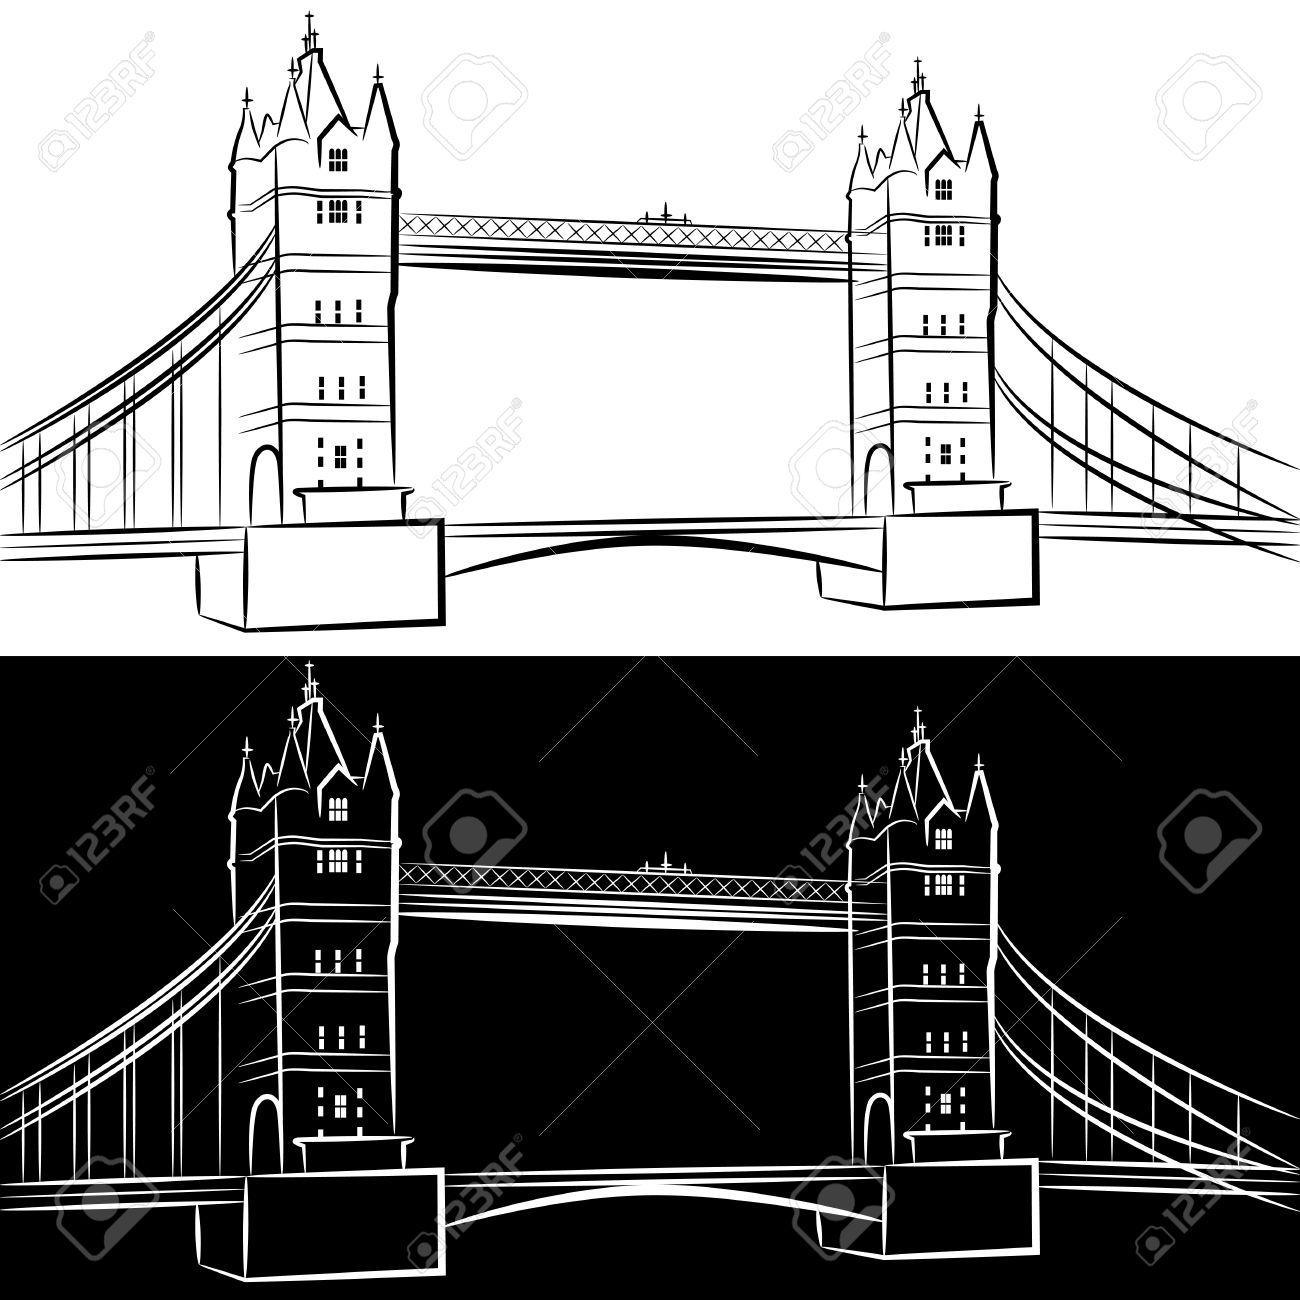 An image of a london bridge drawing set. Stock Vector - 14662057